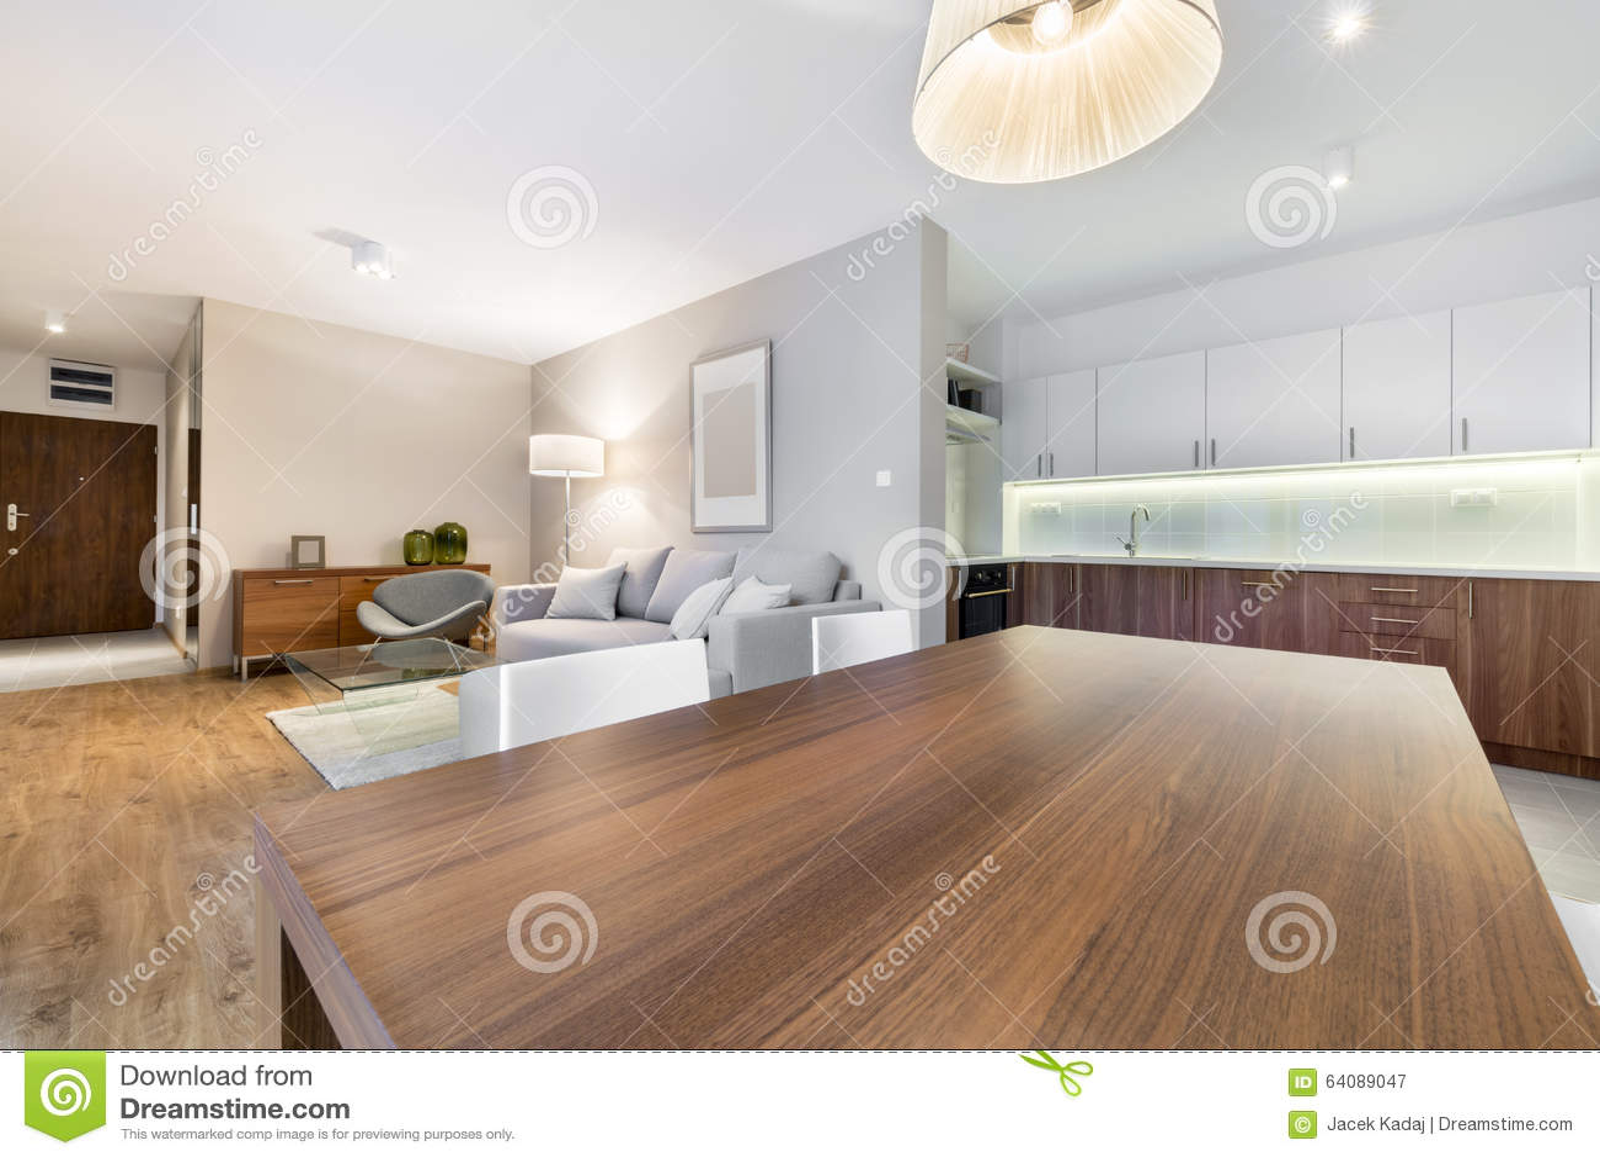 Binnenlands Ontwerp: Woonkamer En Keuken Stock Afbeelding ...